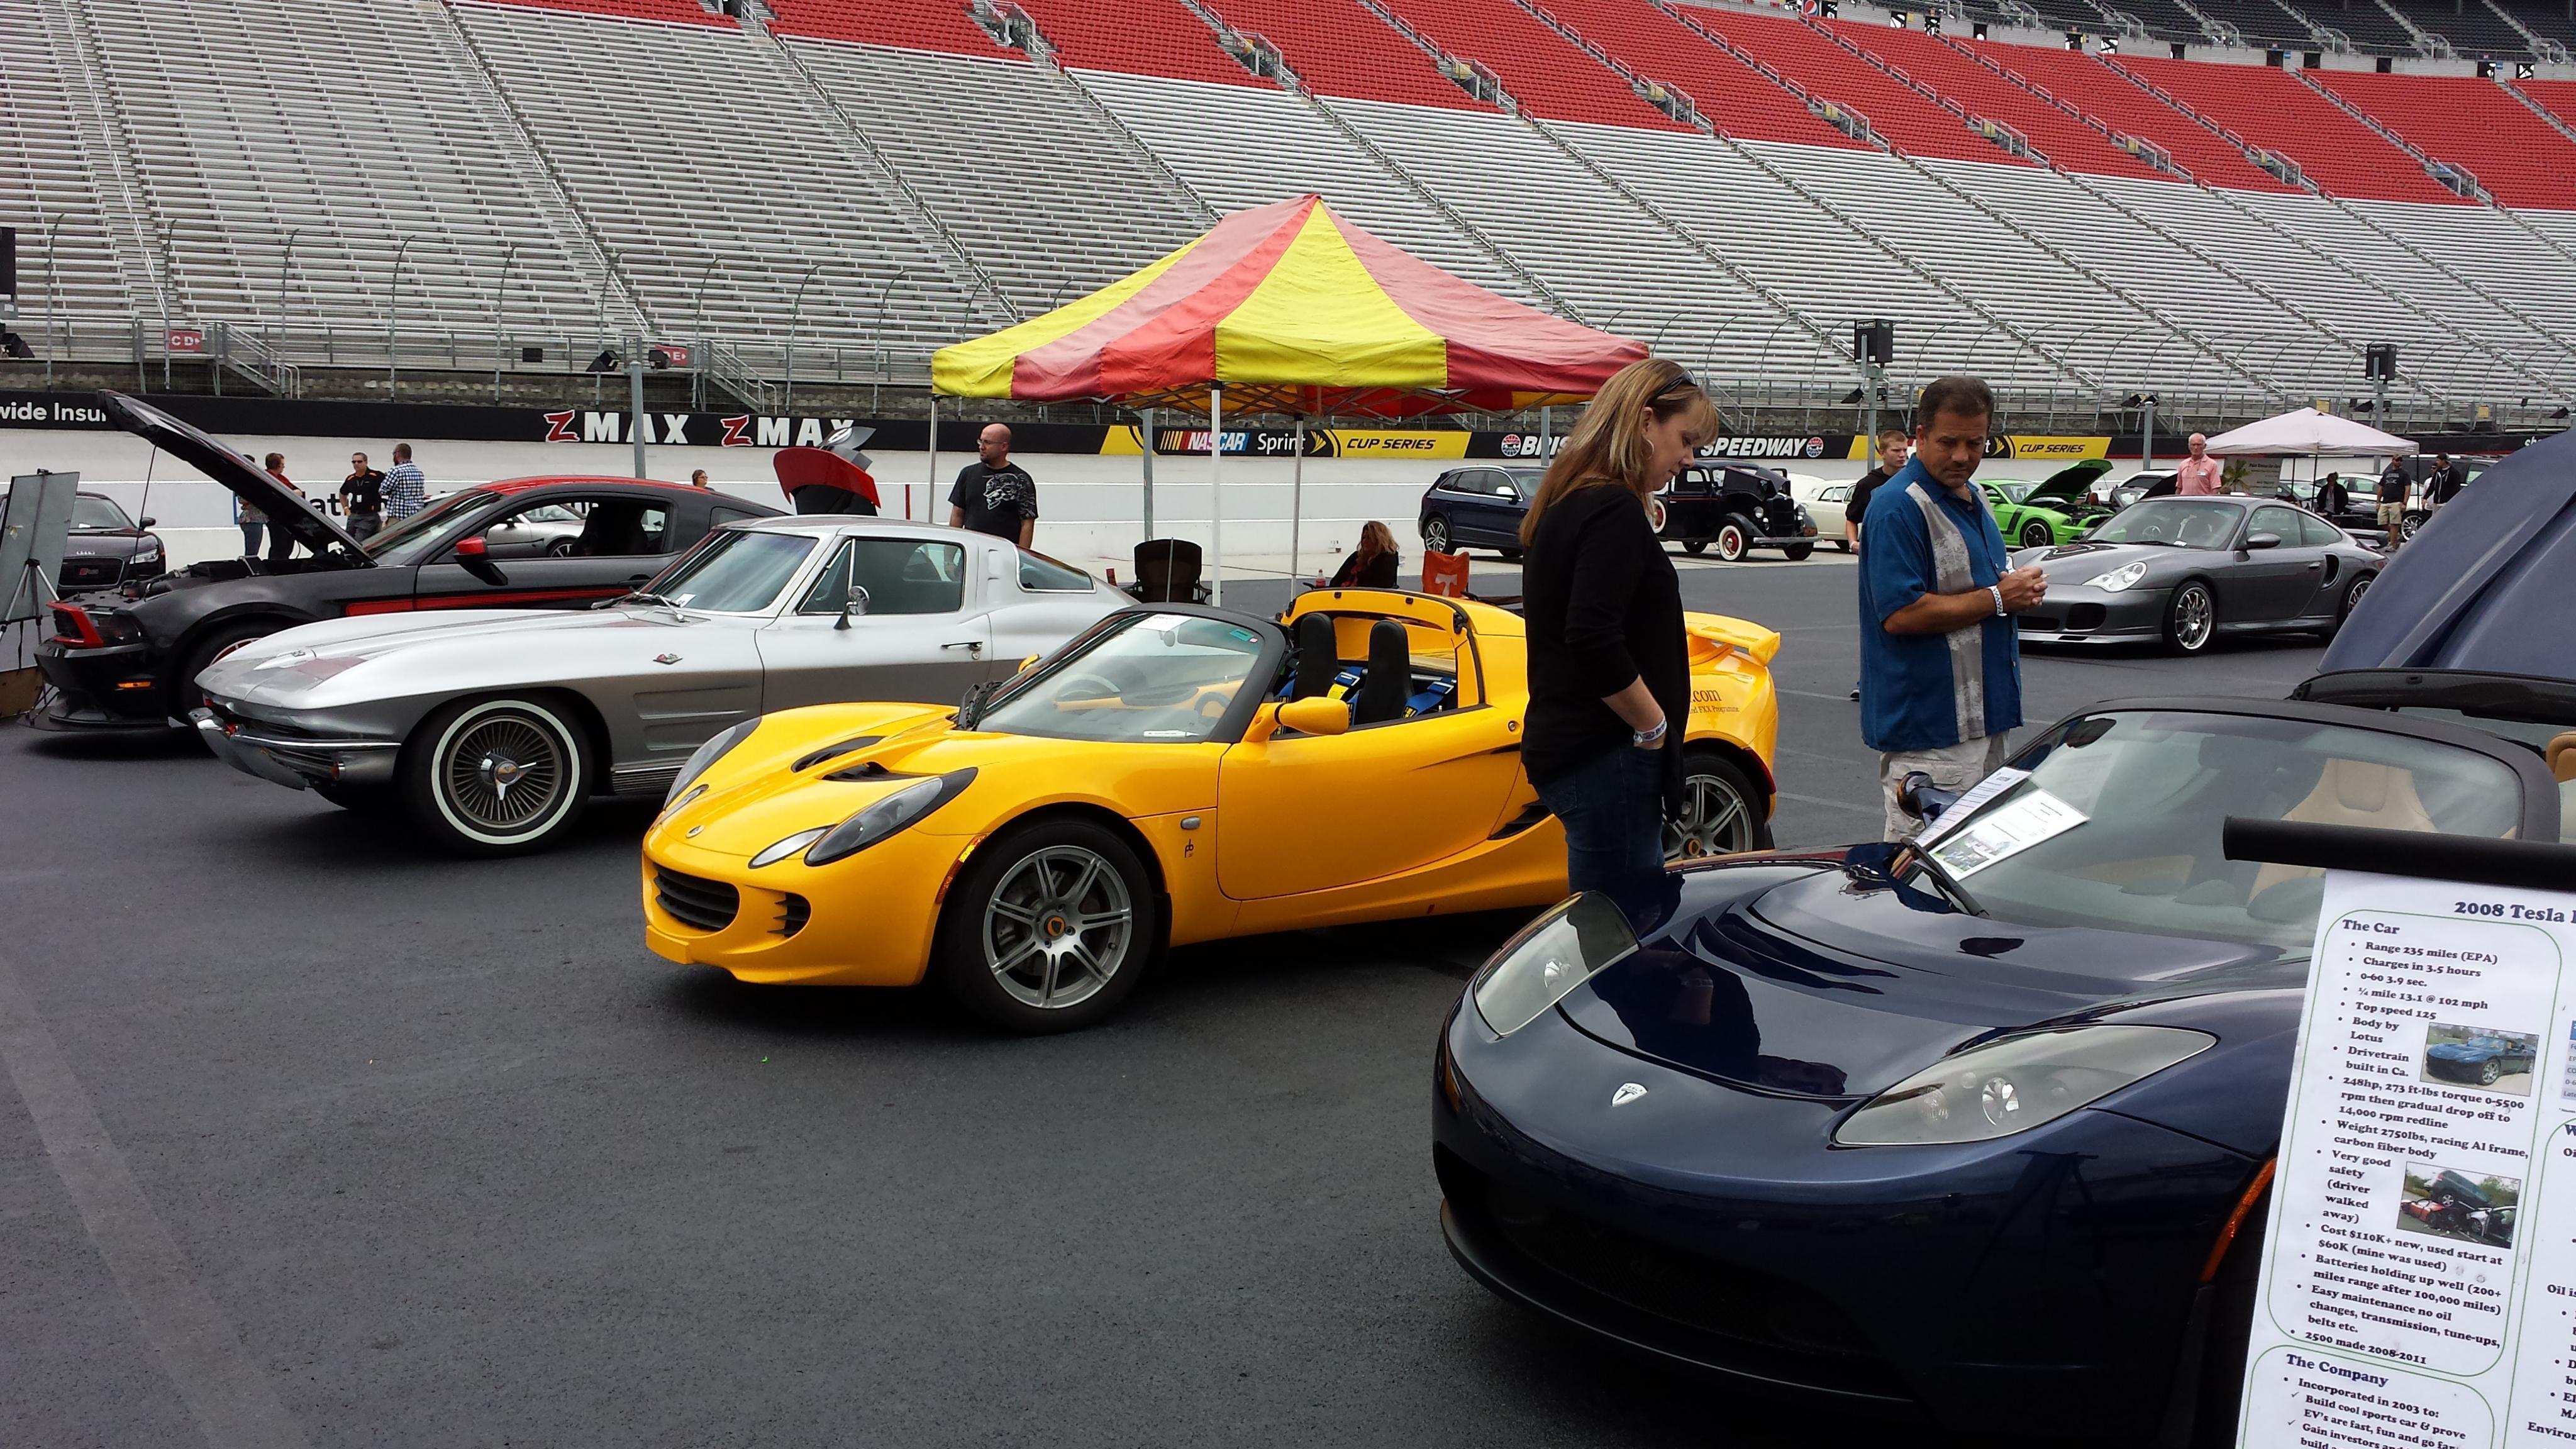 Speedway_Charities (2).jpg